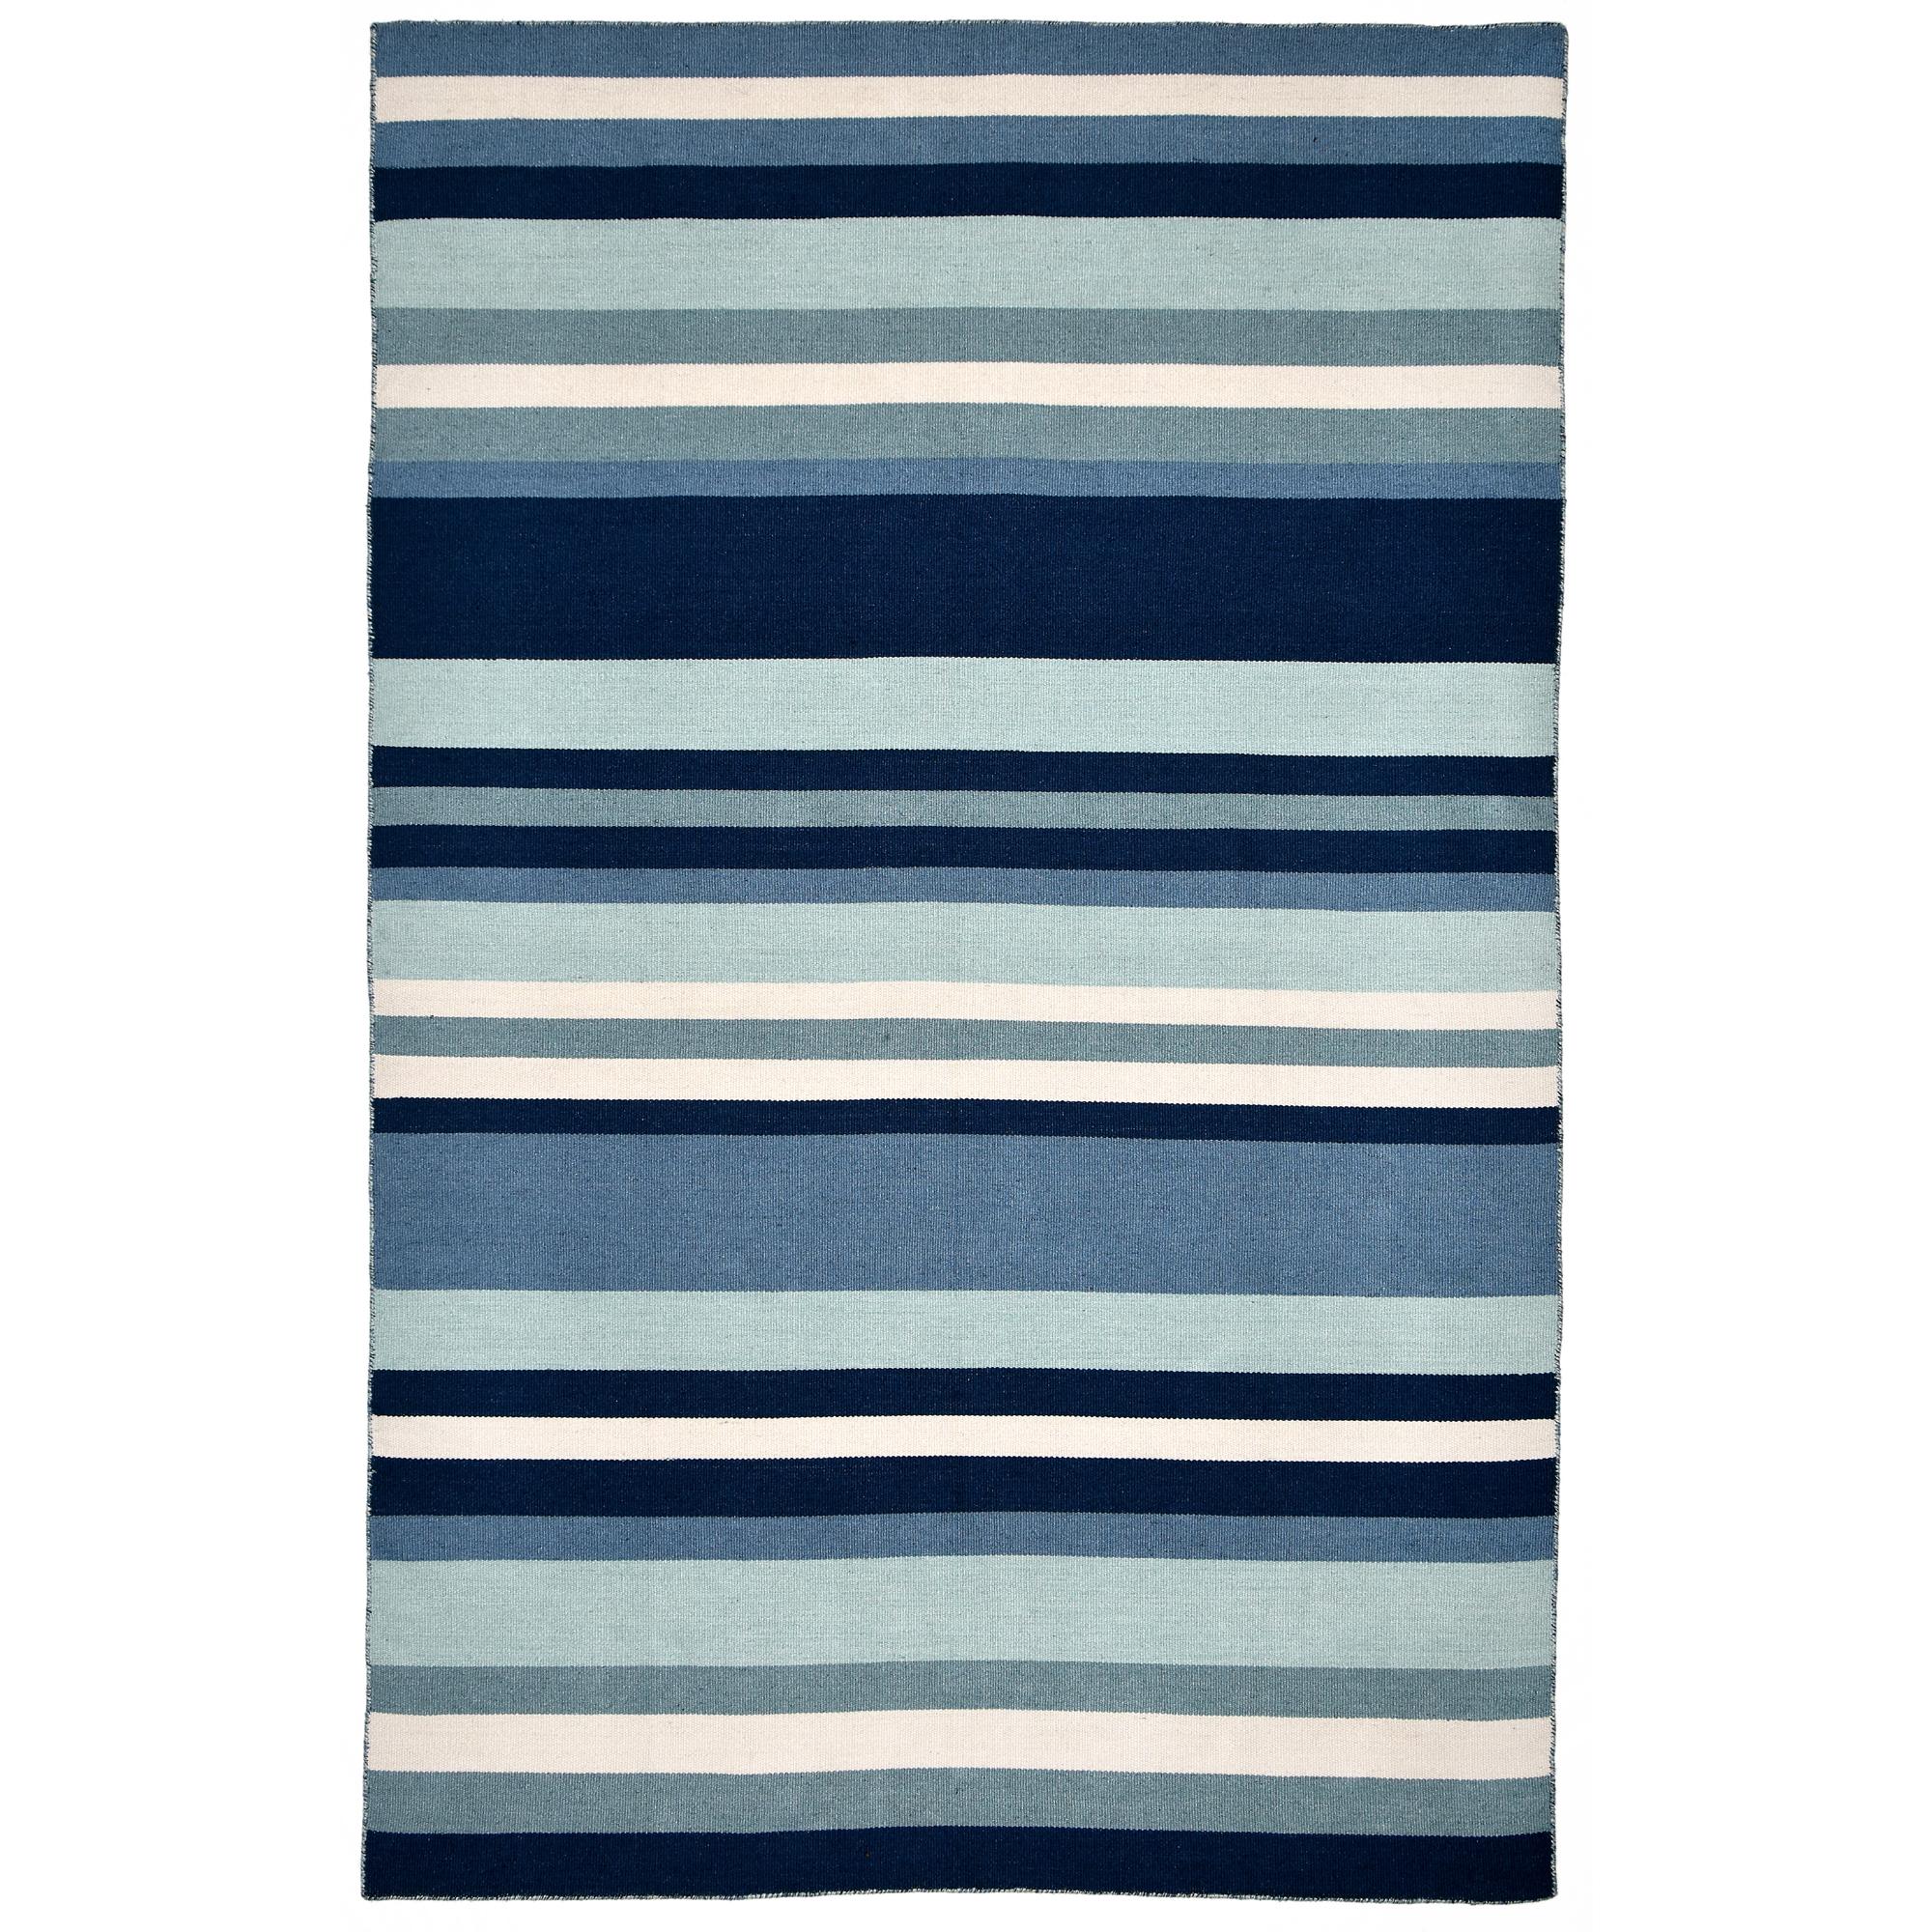 of size floortex pad desk your full costco rug rugs memory decor mats floors design depot bamboo plastic beach mat for astonishing office best wood foam carpet chair protector flooring floor